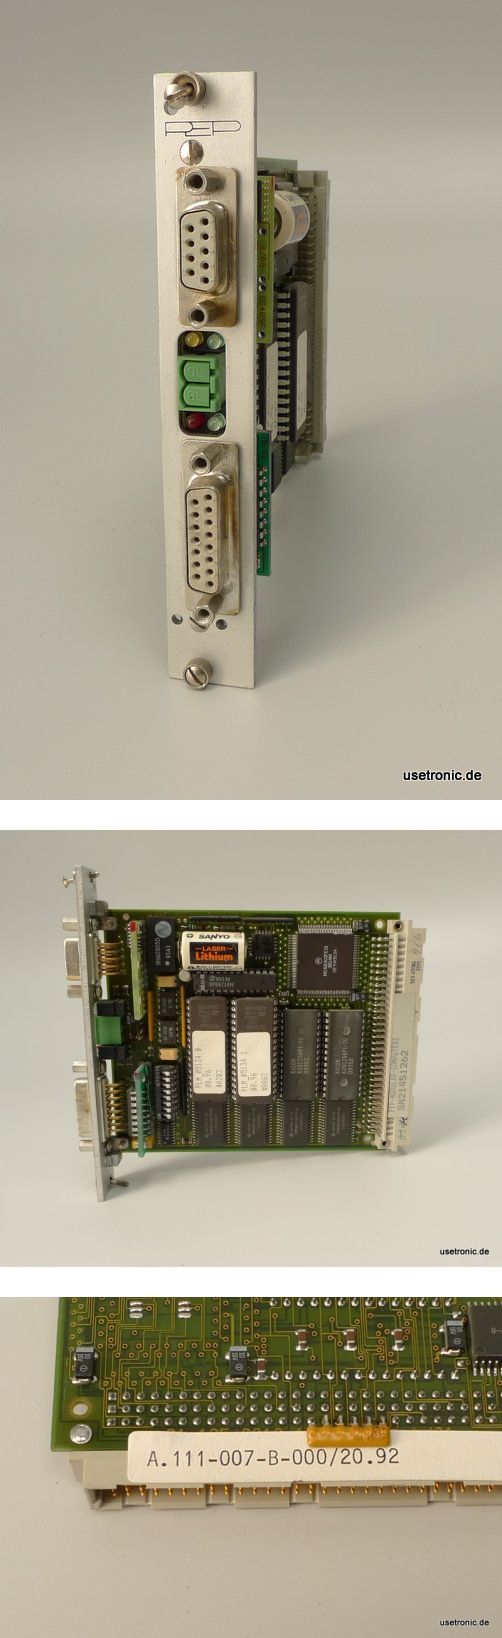 BDT Bavaria Digital Technik PLM-V A.111-007-B-000